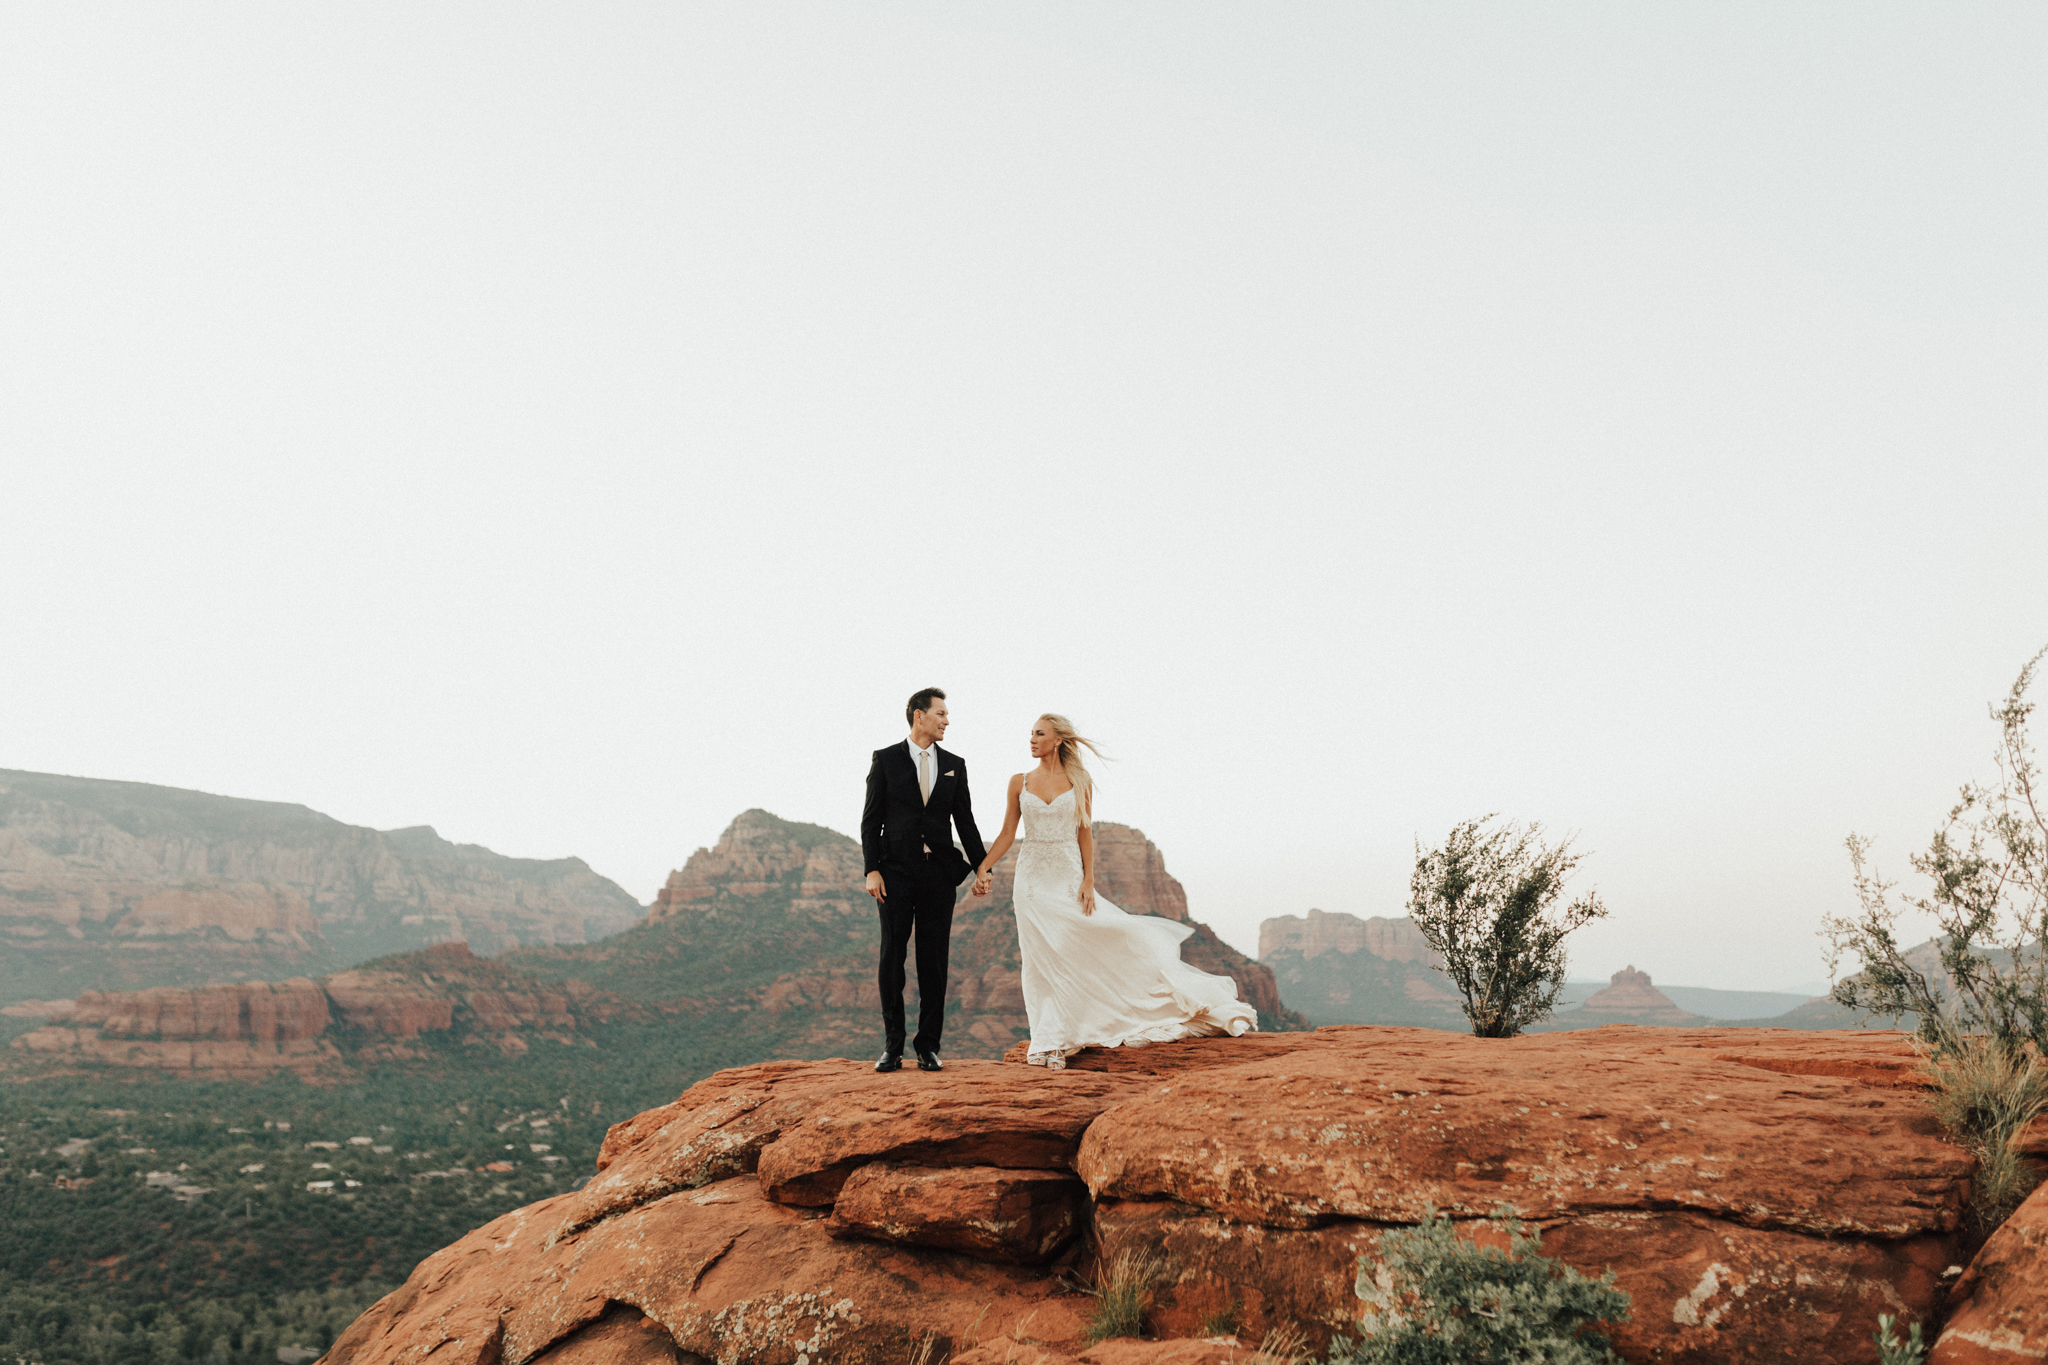 Arizona-Adventure-Elopement-Wedding-Photographer-83.jpg